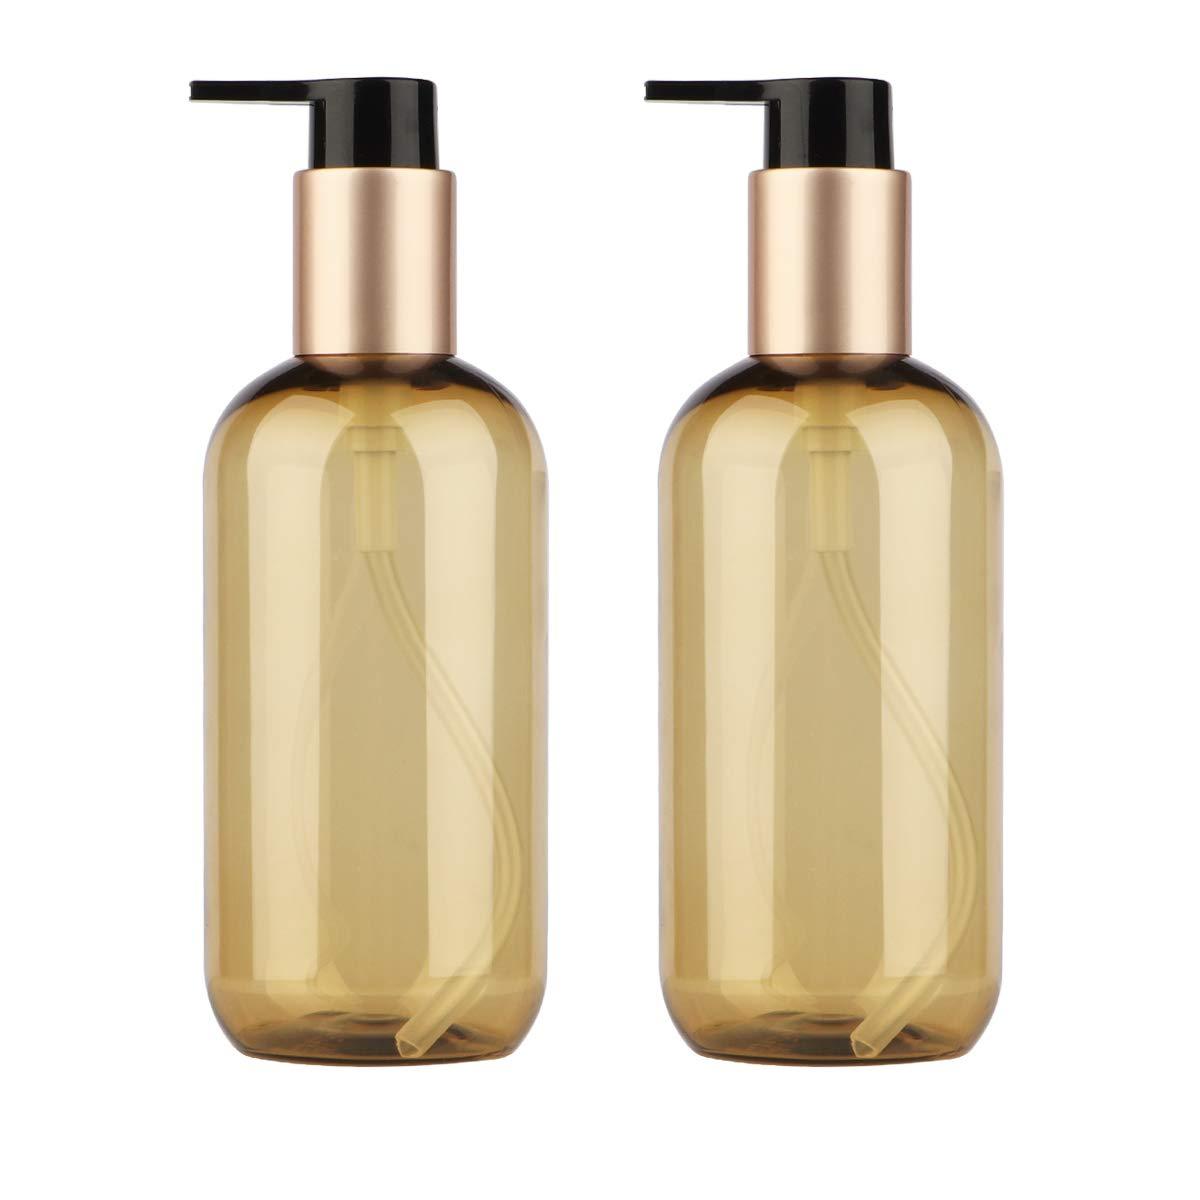 Yeeco PumpBottle, 2 PCS Plastic Pump Bottles Dispenser Empty 8.5oz/250ml Refillable Lotion Pump Bottle Set for Shampoo Conditioner Body Wash Lotion Dispenser with Pump-Clear Brown